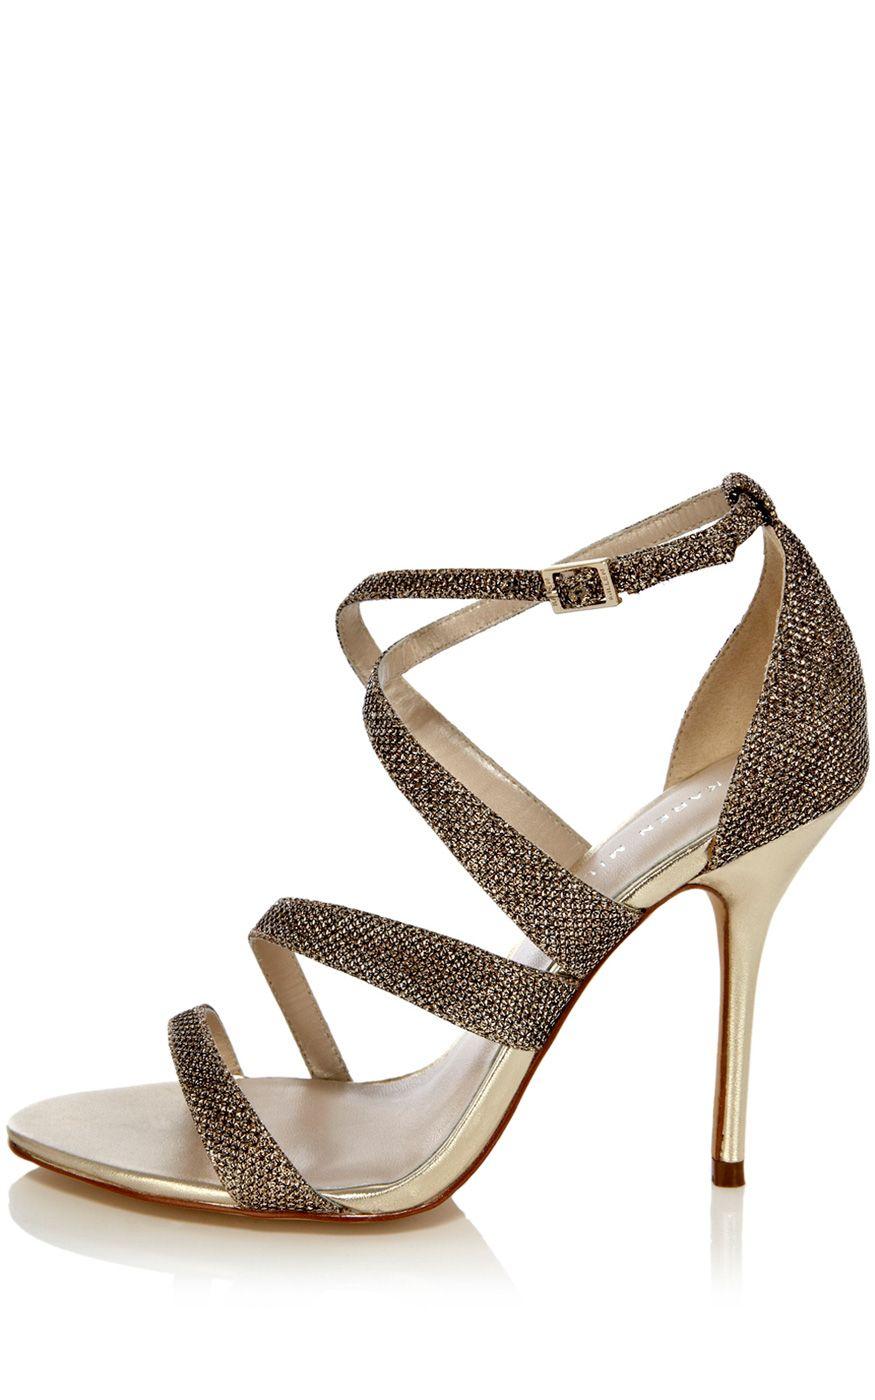 Shoes For Wedding 54 Nice KAREN MILLEN Gold Crystal